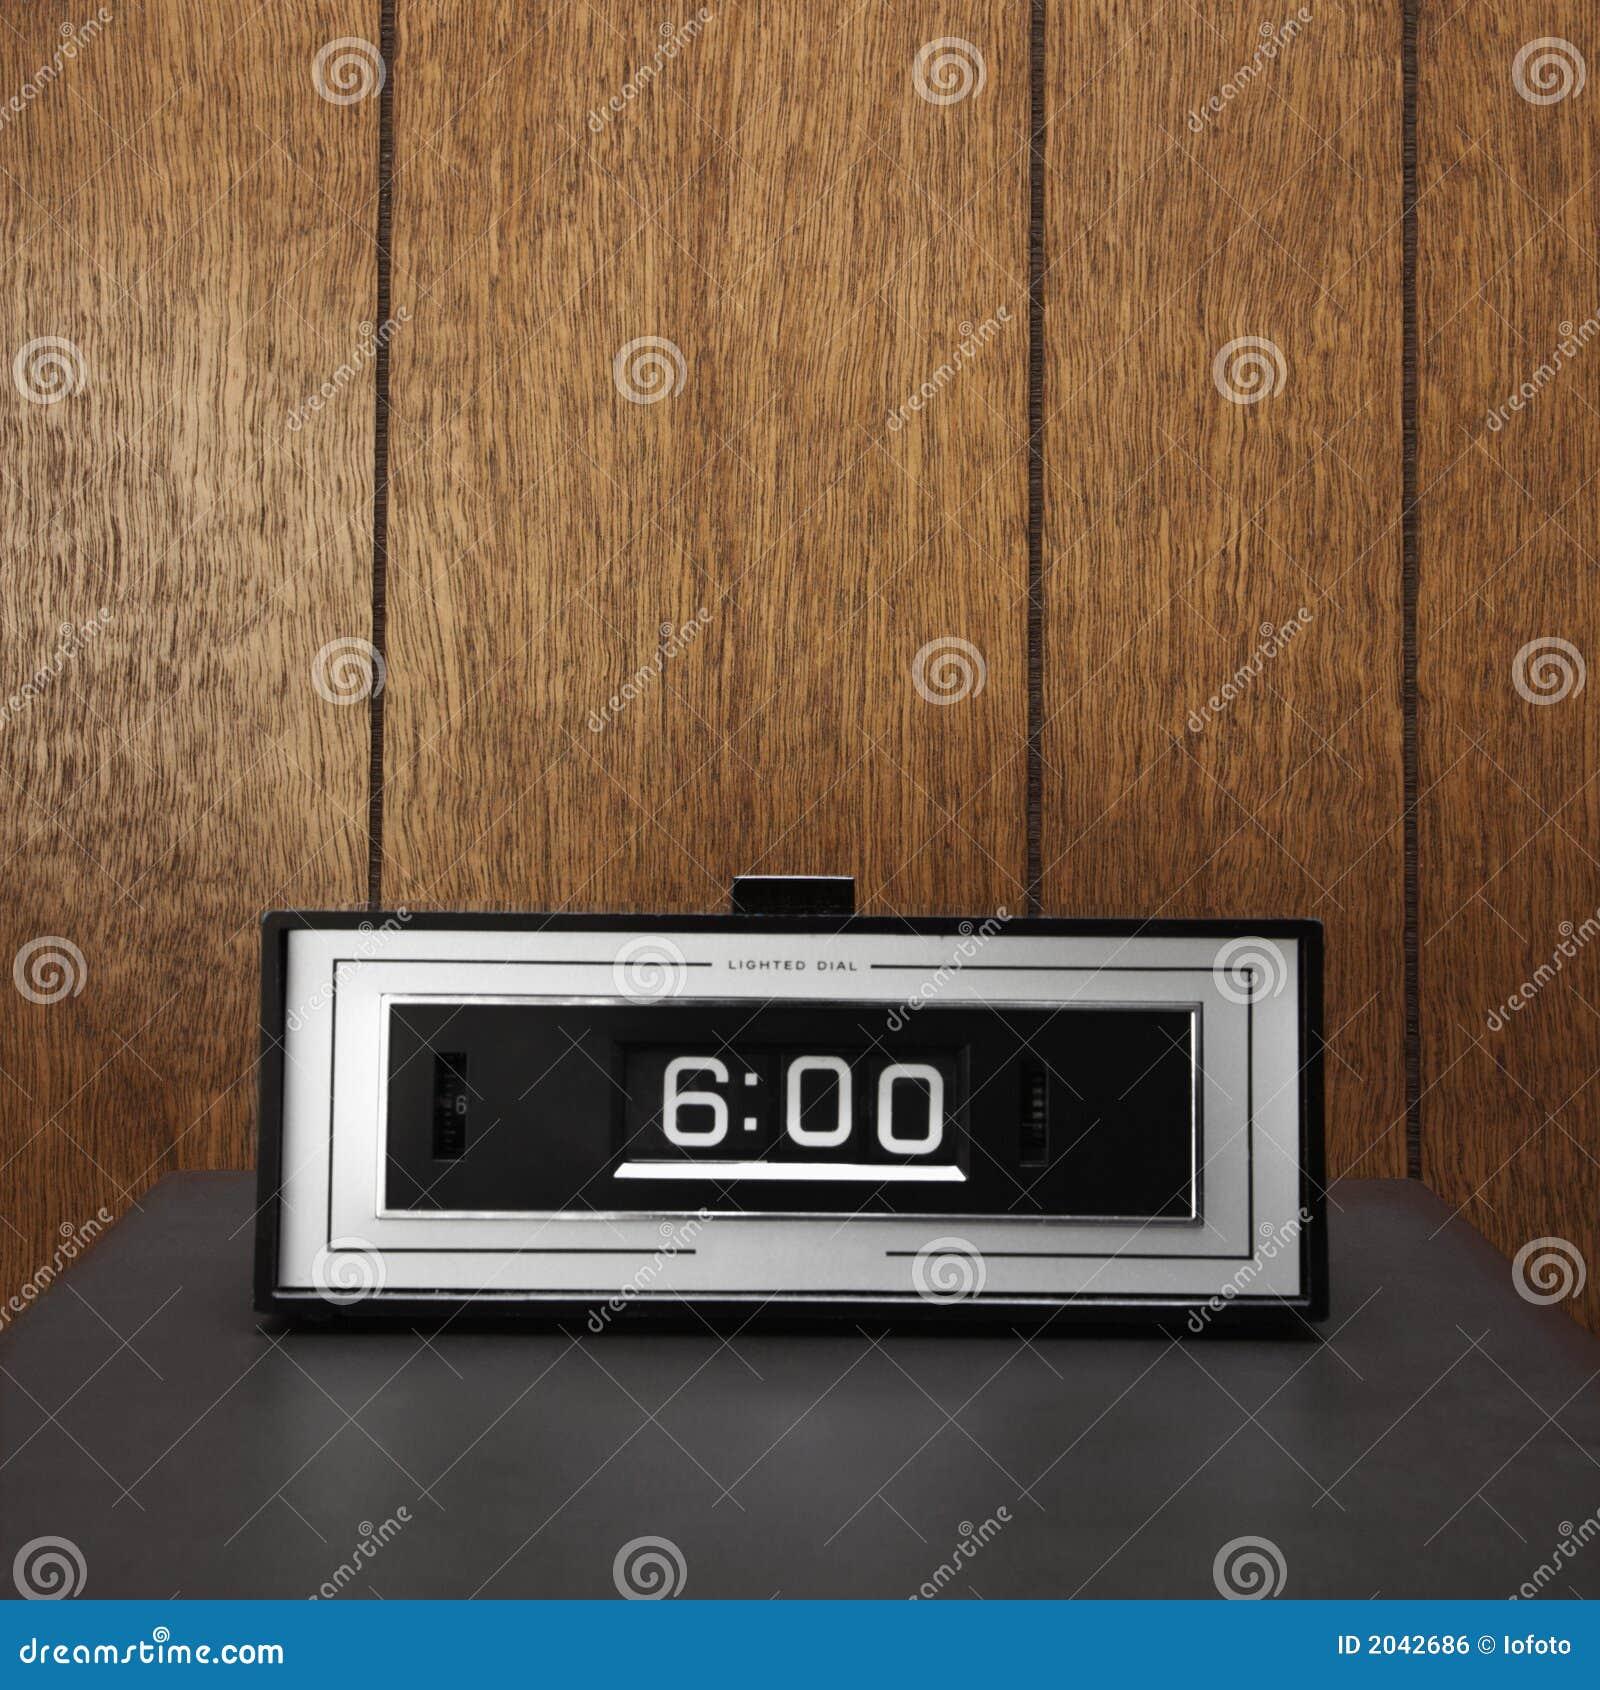 Retro Clock Set For 6:00. Royalty Free Stock Image - Image ...